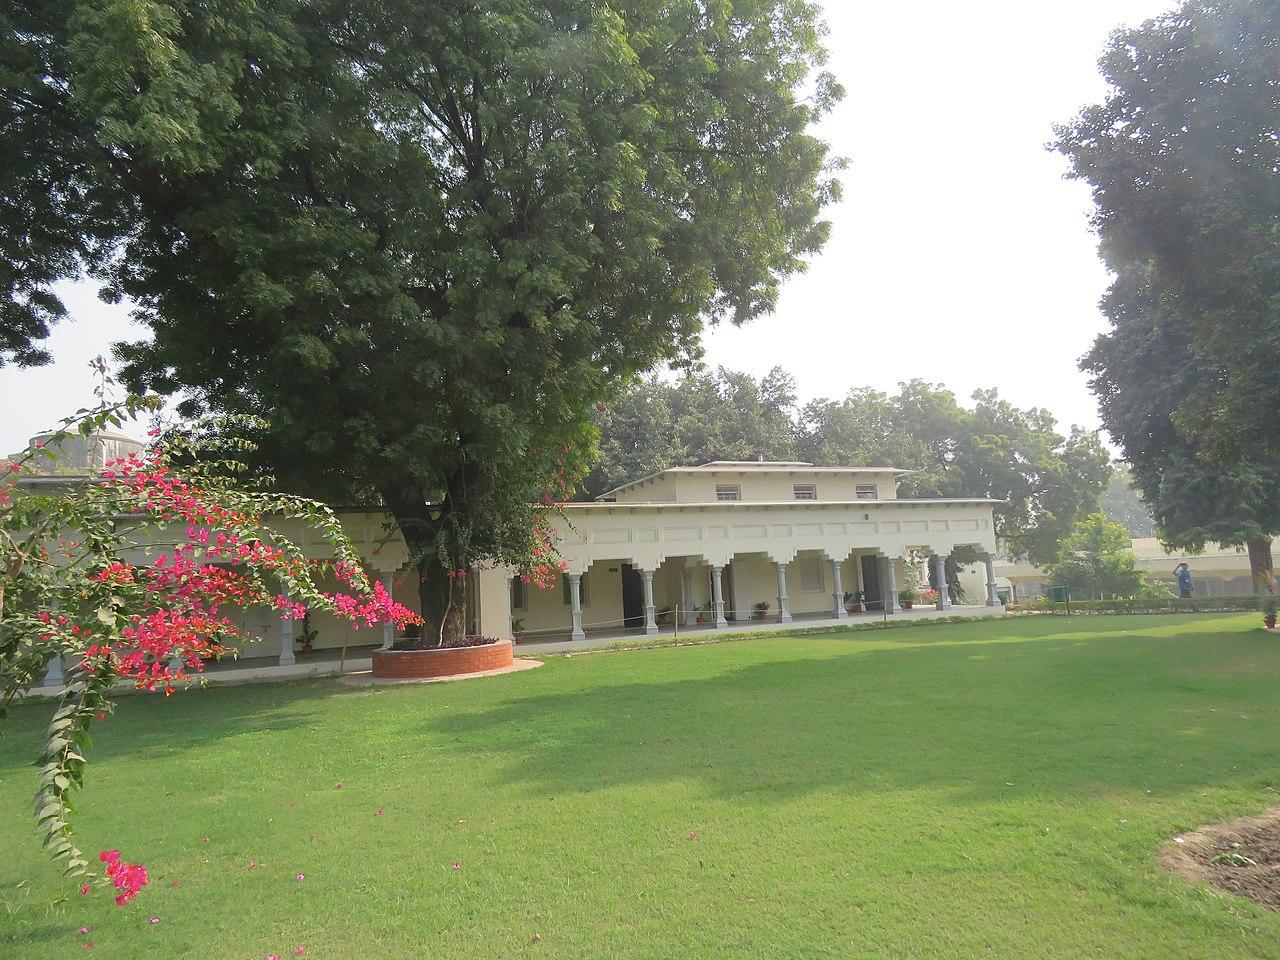 Amazing Place in Prayagraj-Swaraj Bhavan